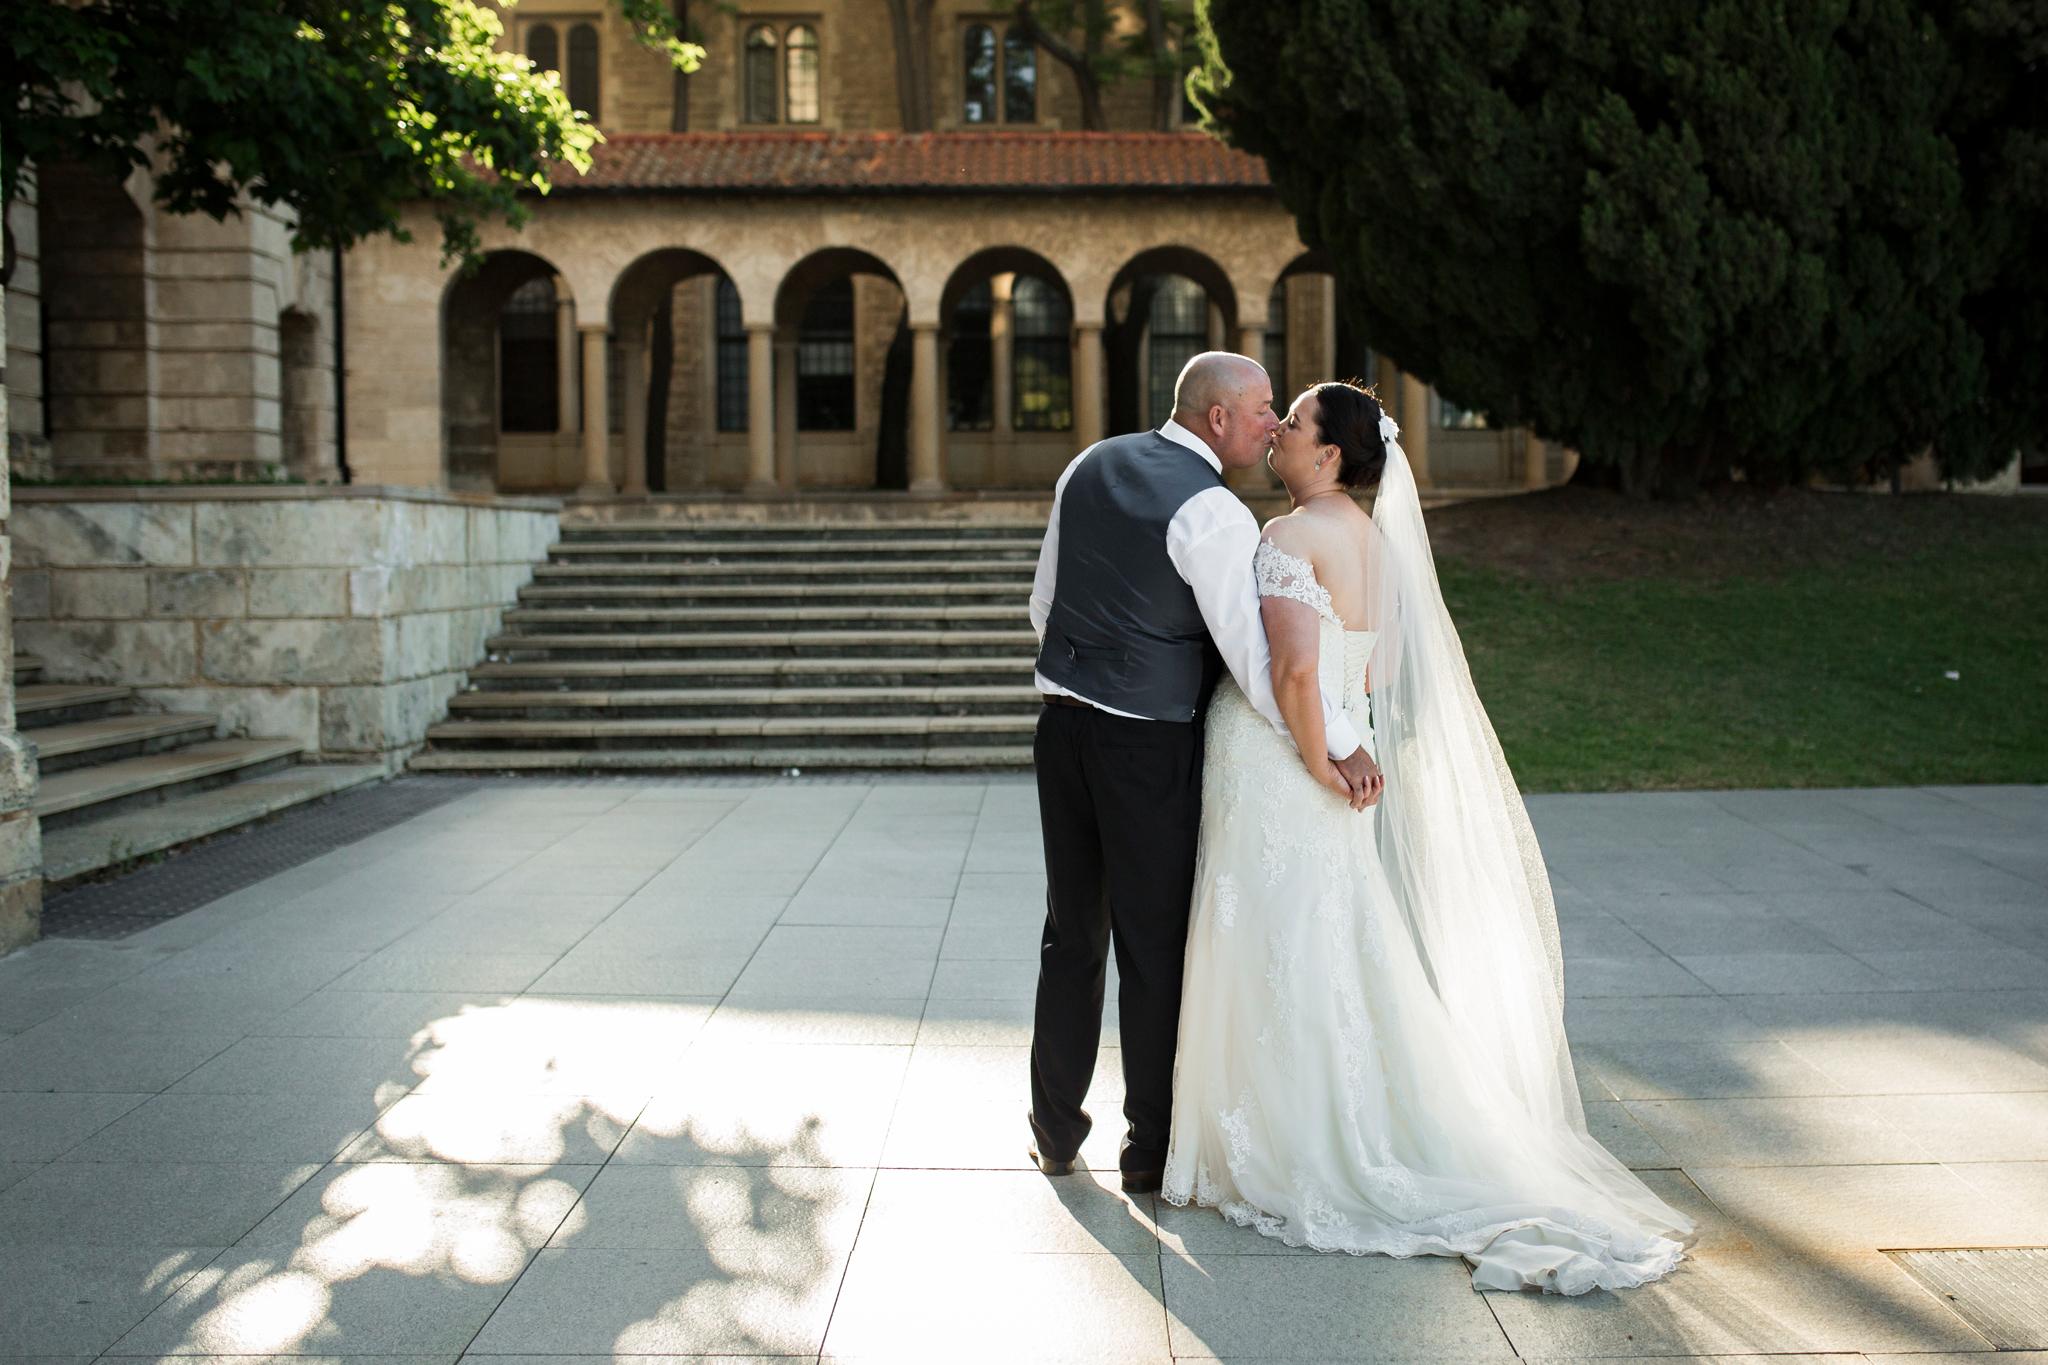 Kyme-steve-wedding-256.jpg